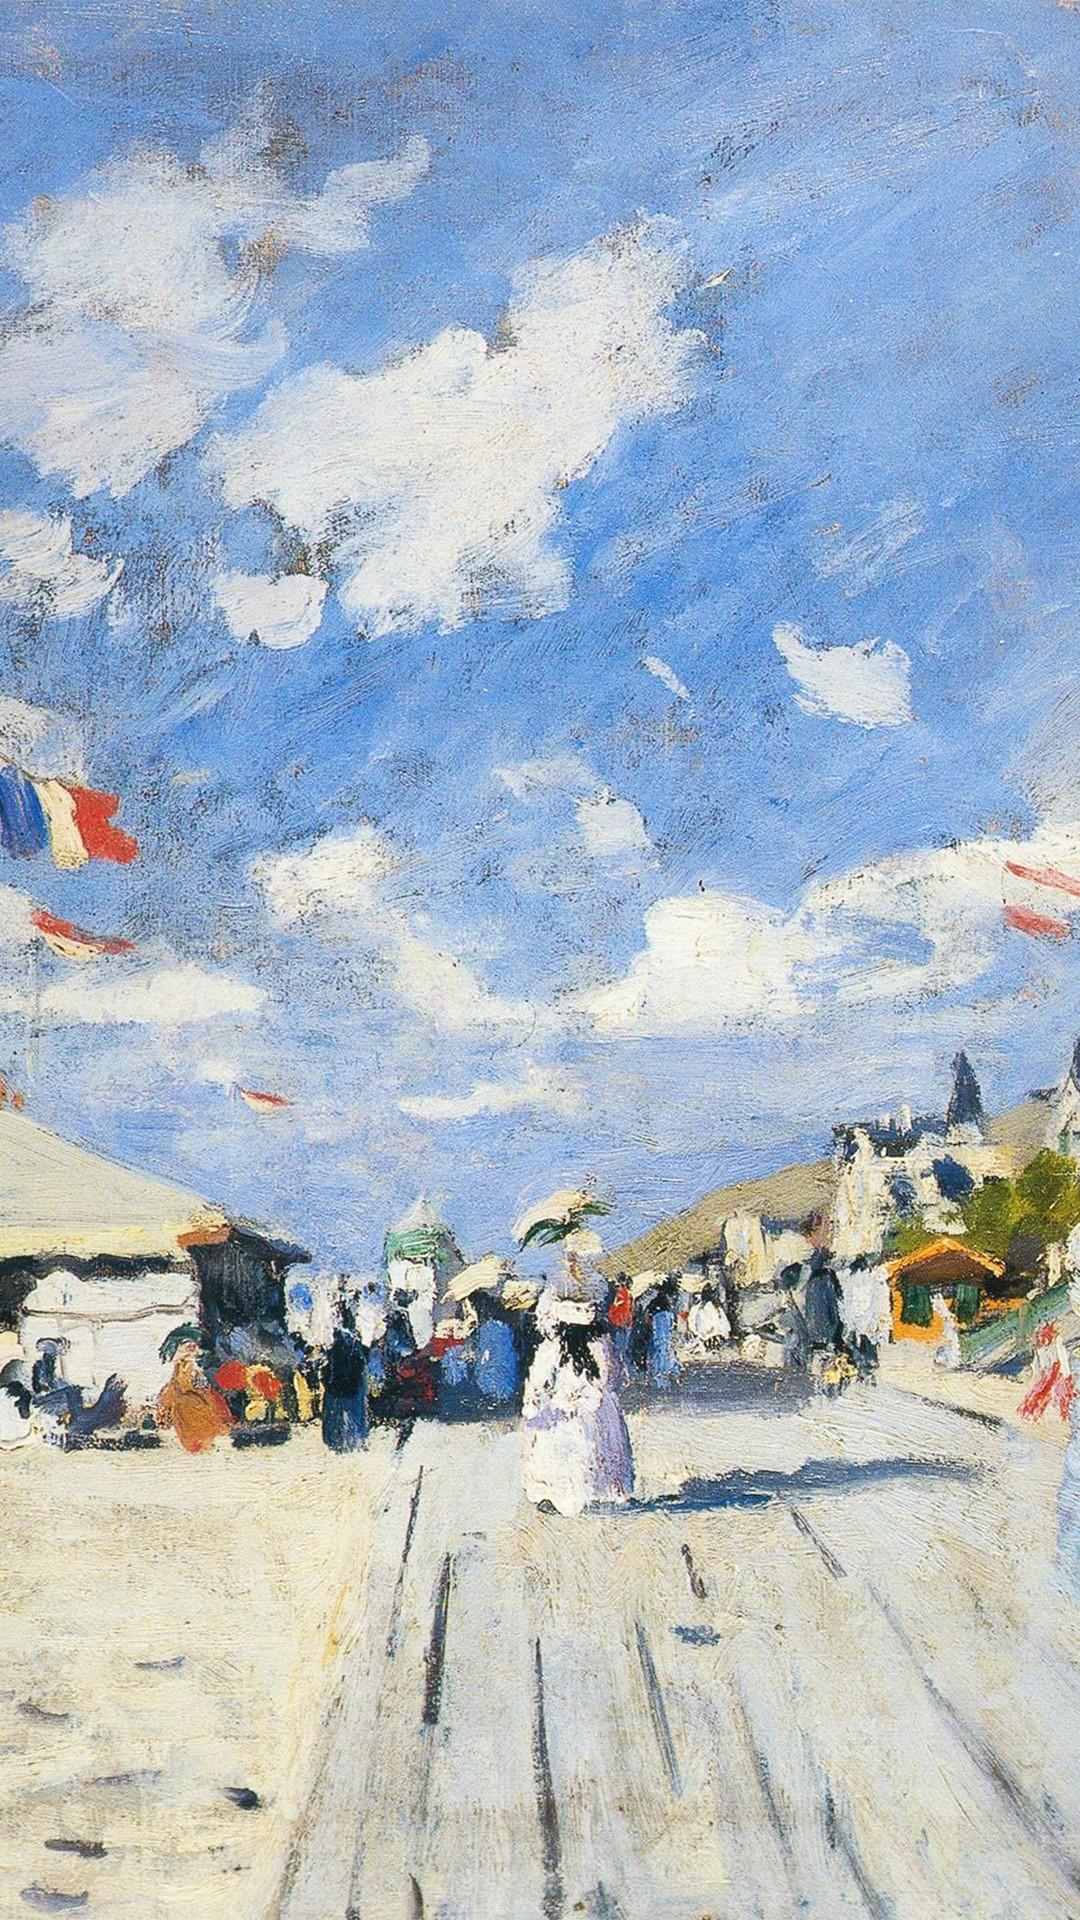 Classic Art Paint Board Walk On Claude Monet Winter Snow #iPhone #6 #plus.  Wallpapers …